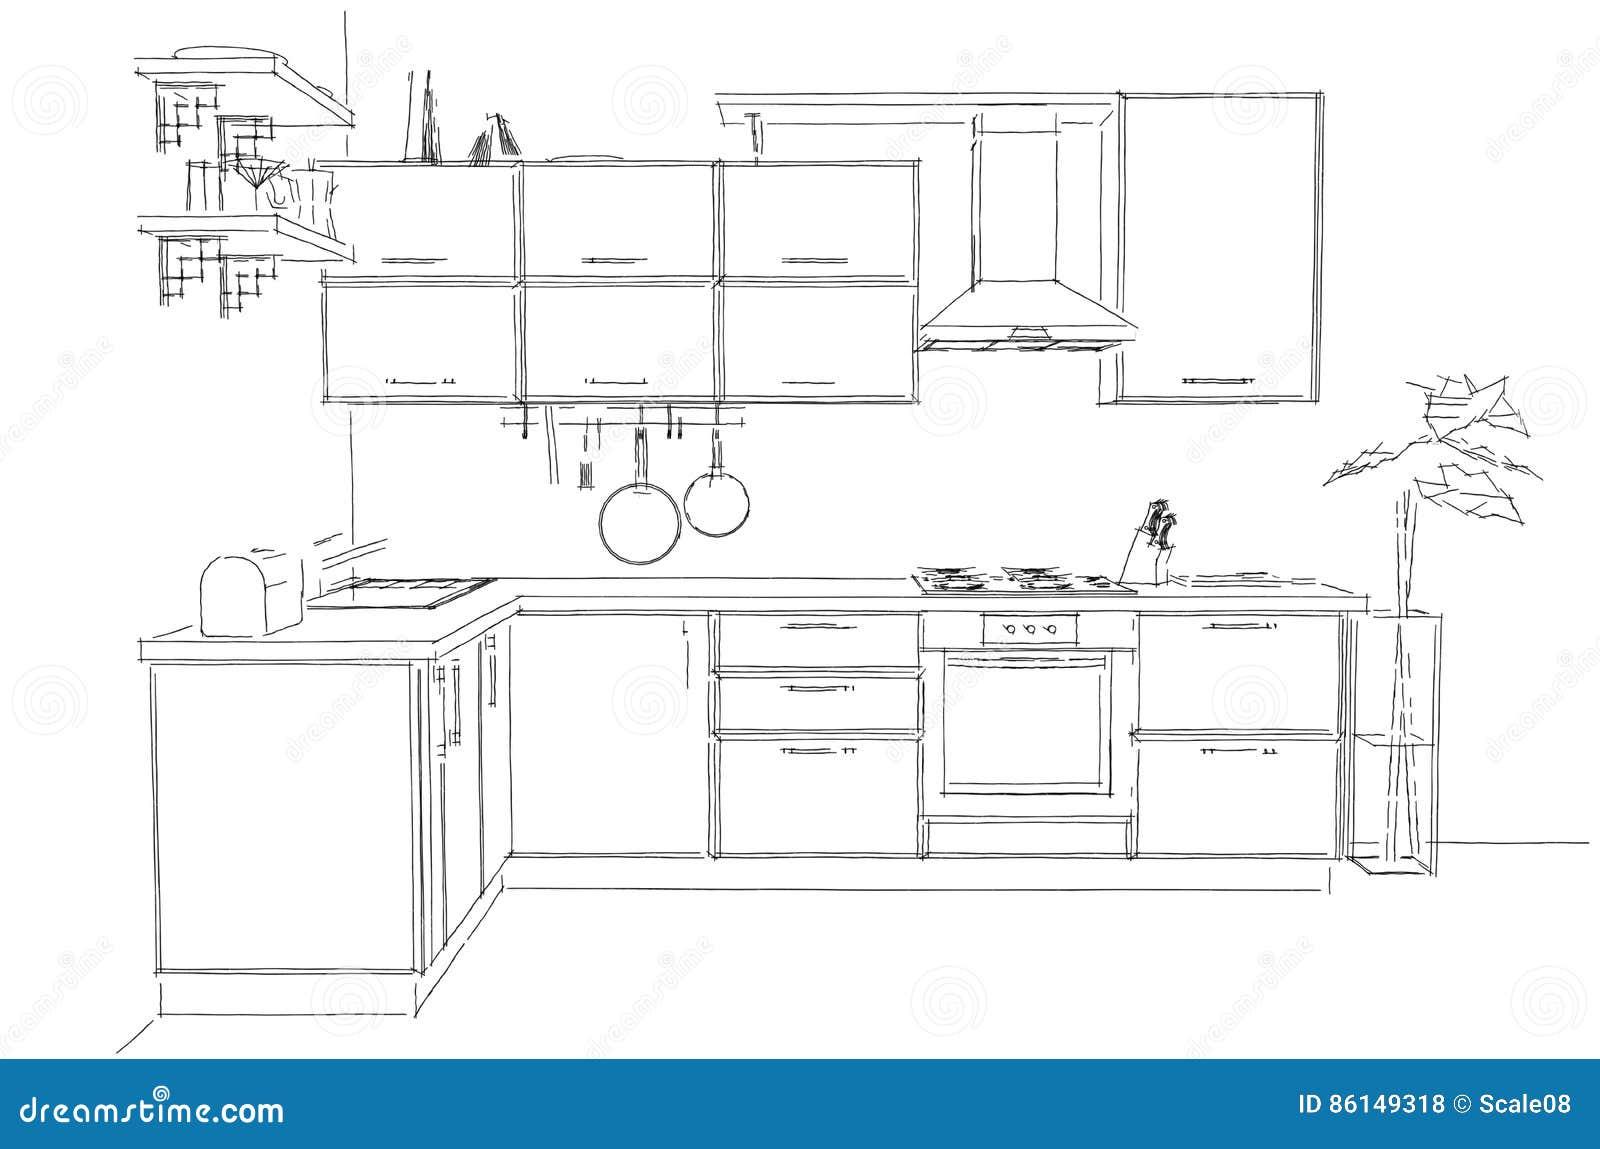 Disegno cucina angolare gt48 regardsdefemmes - Programmi per disegnare cucine ...